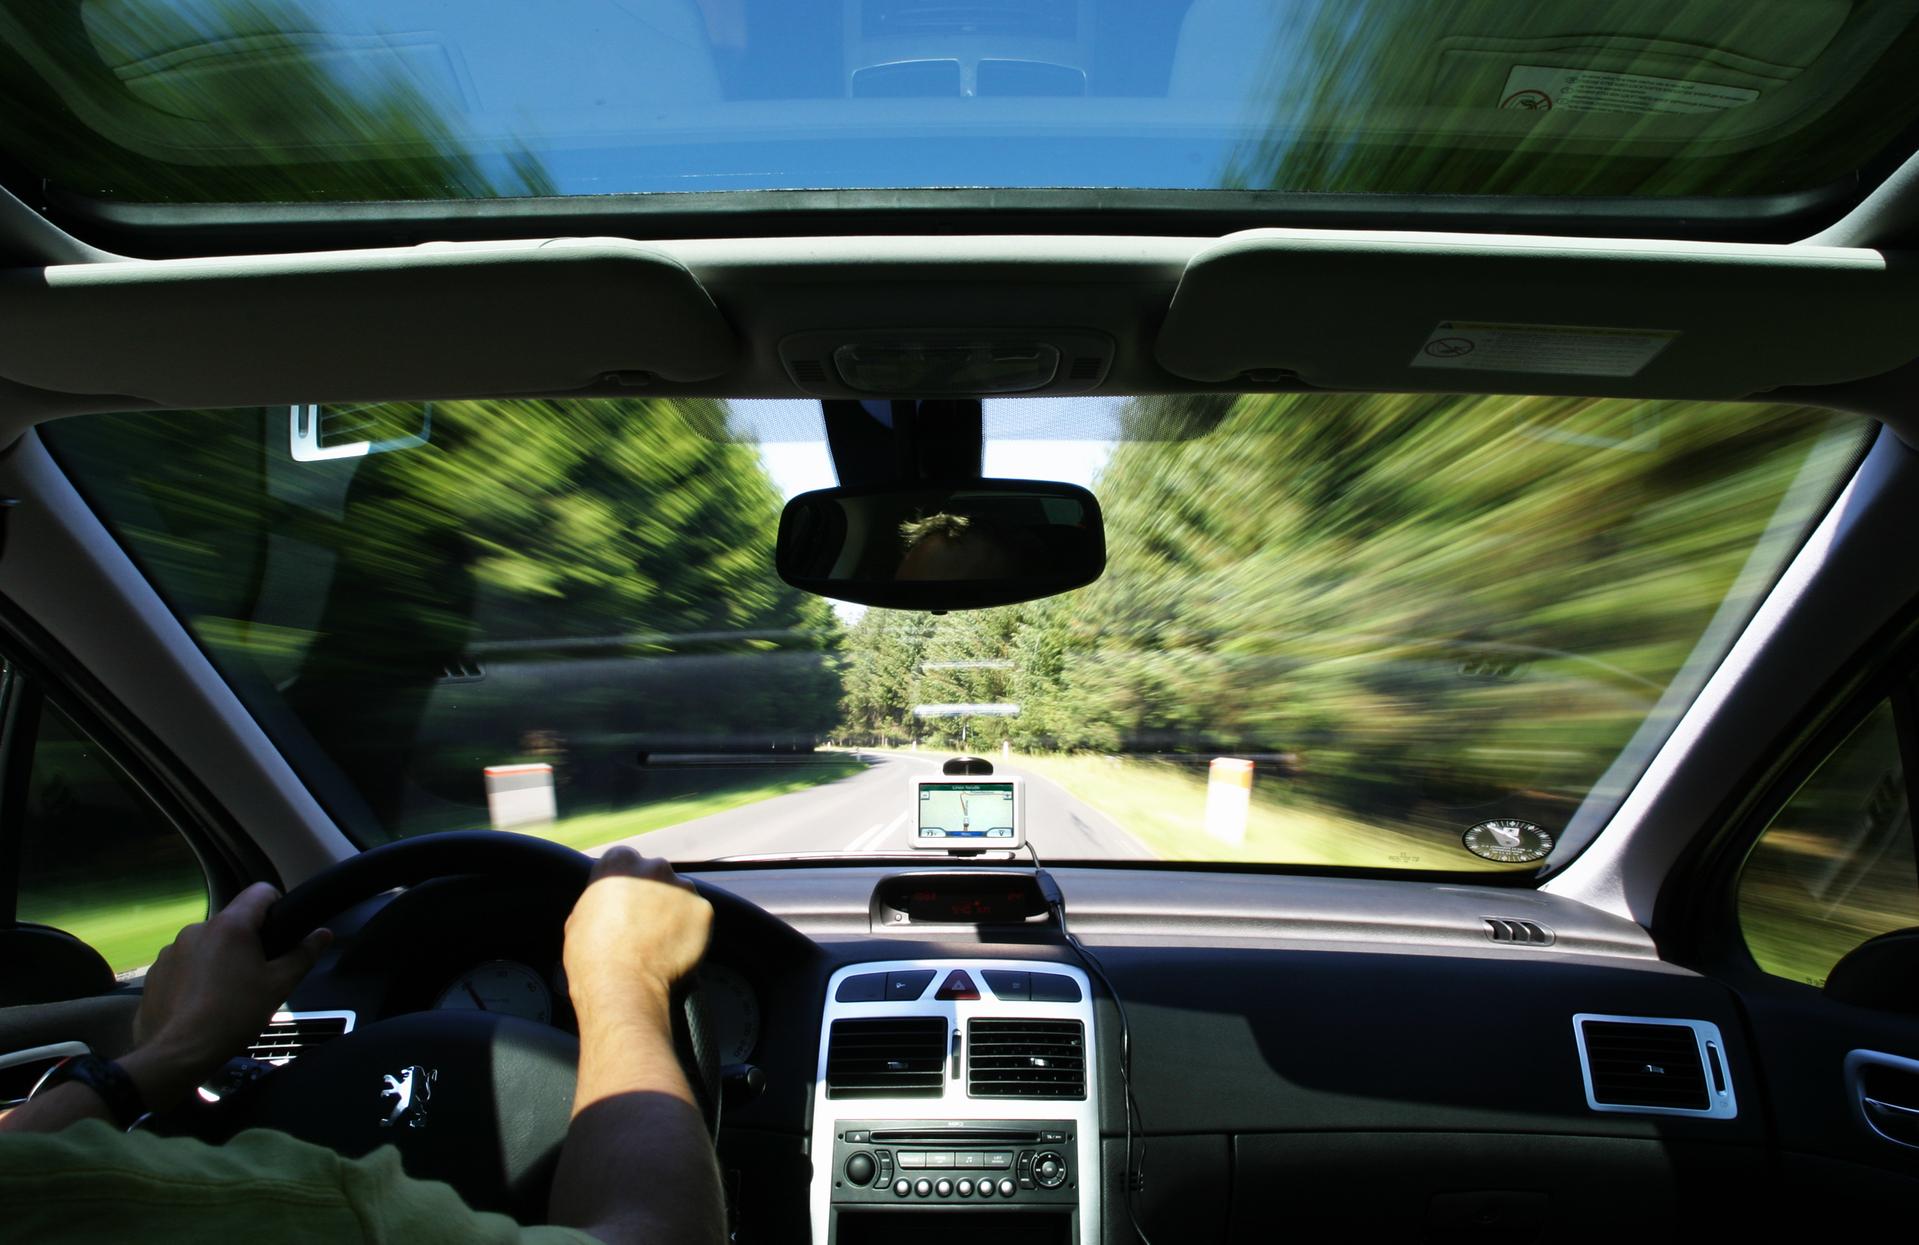 gps-driving-2-1353290-1919x1244